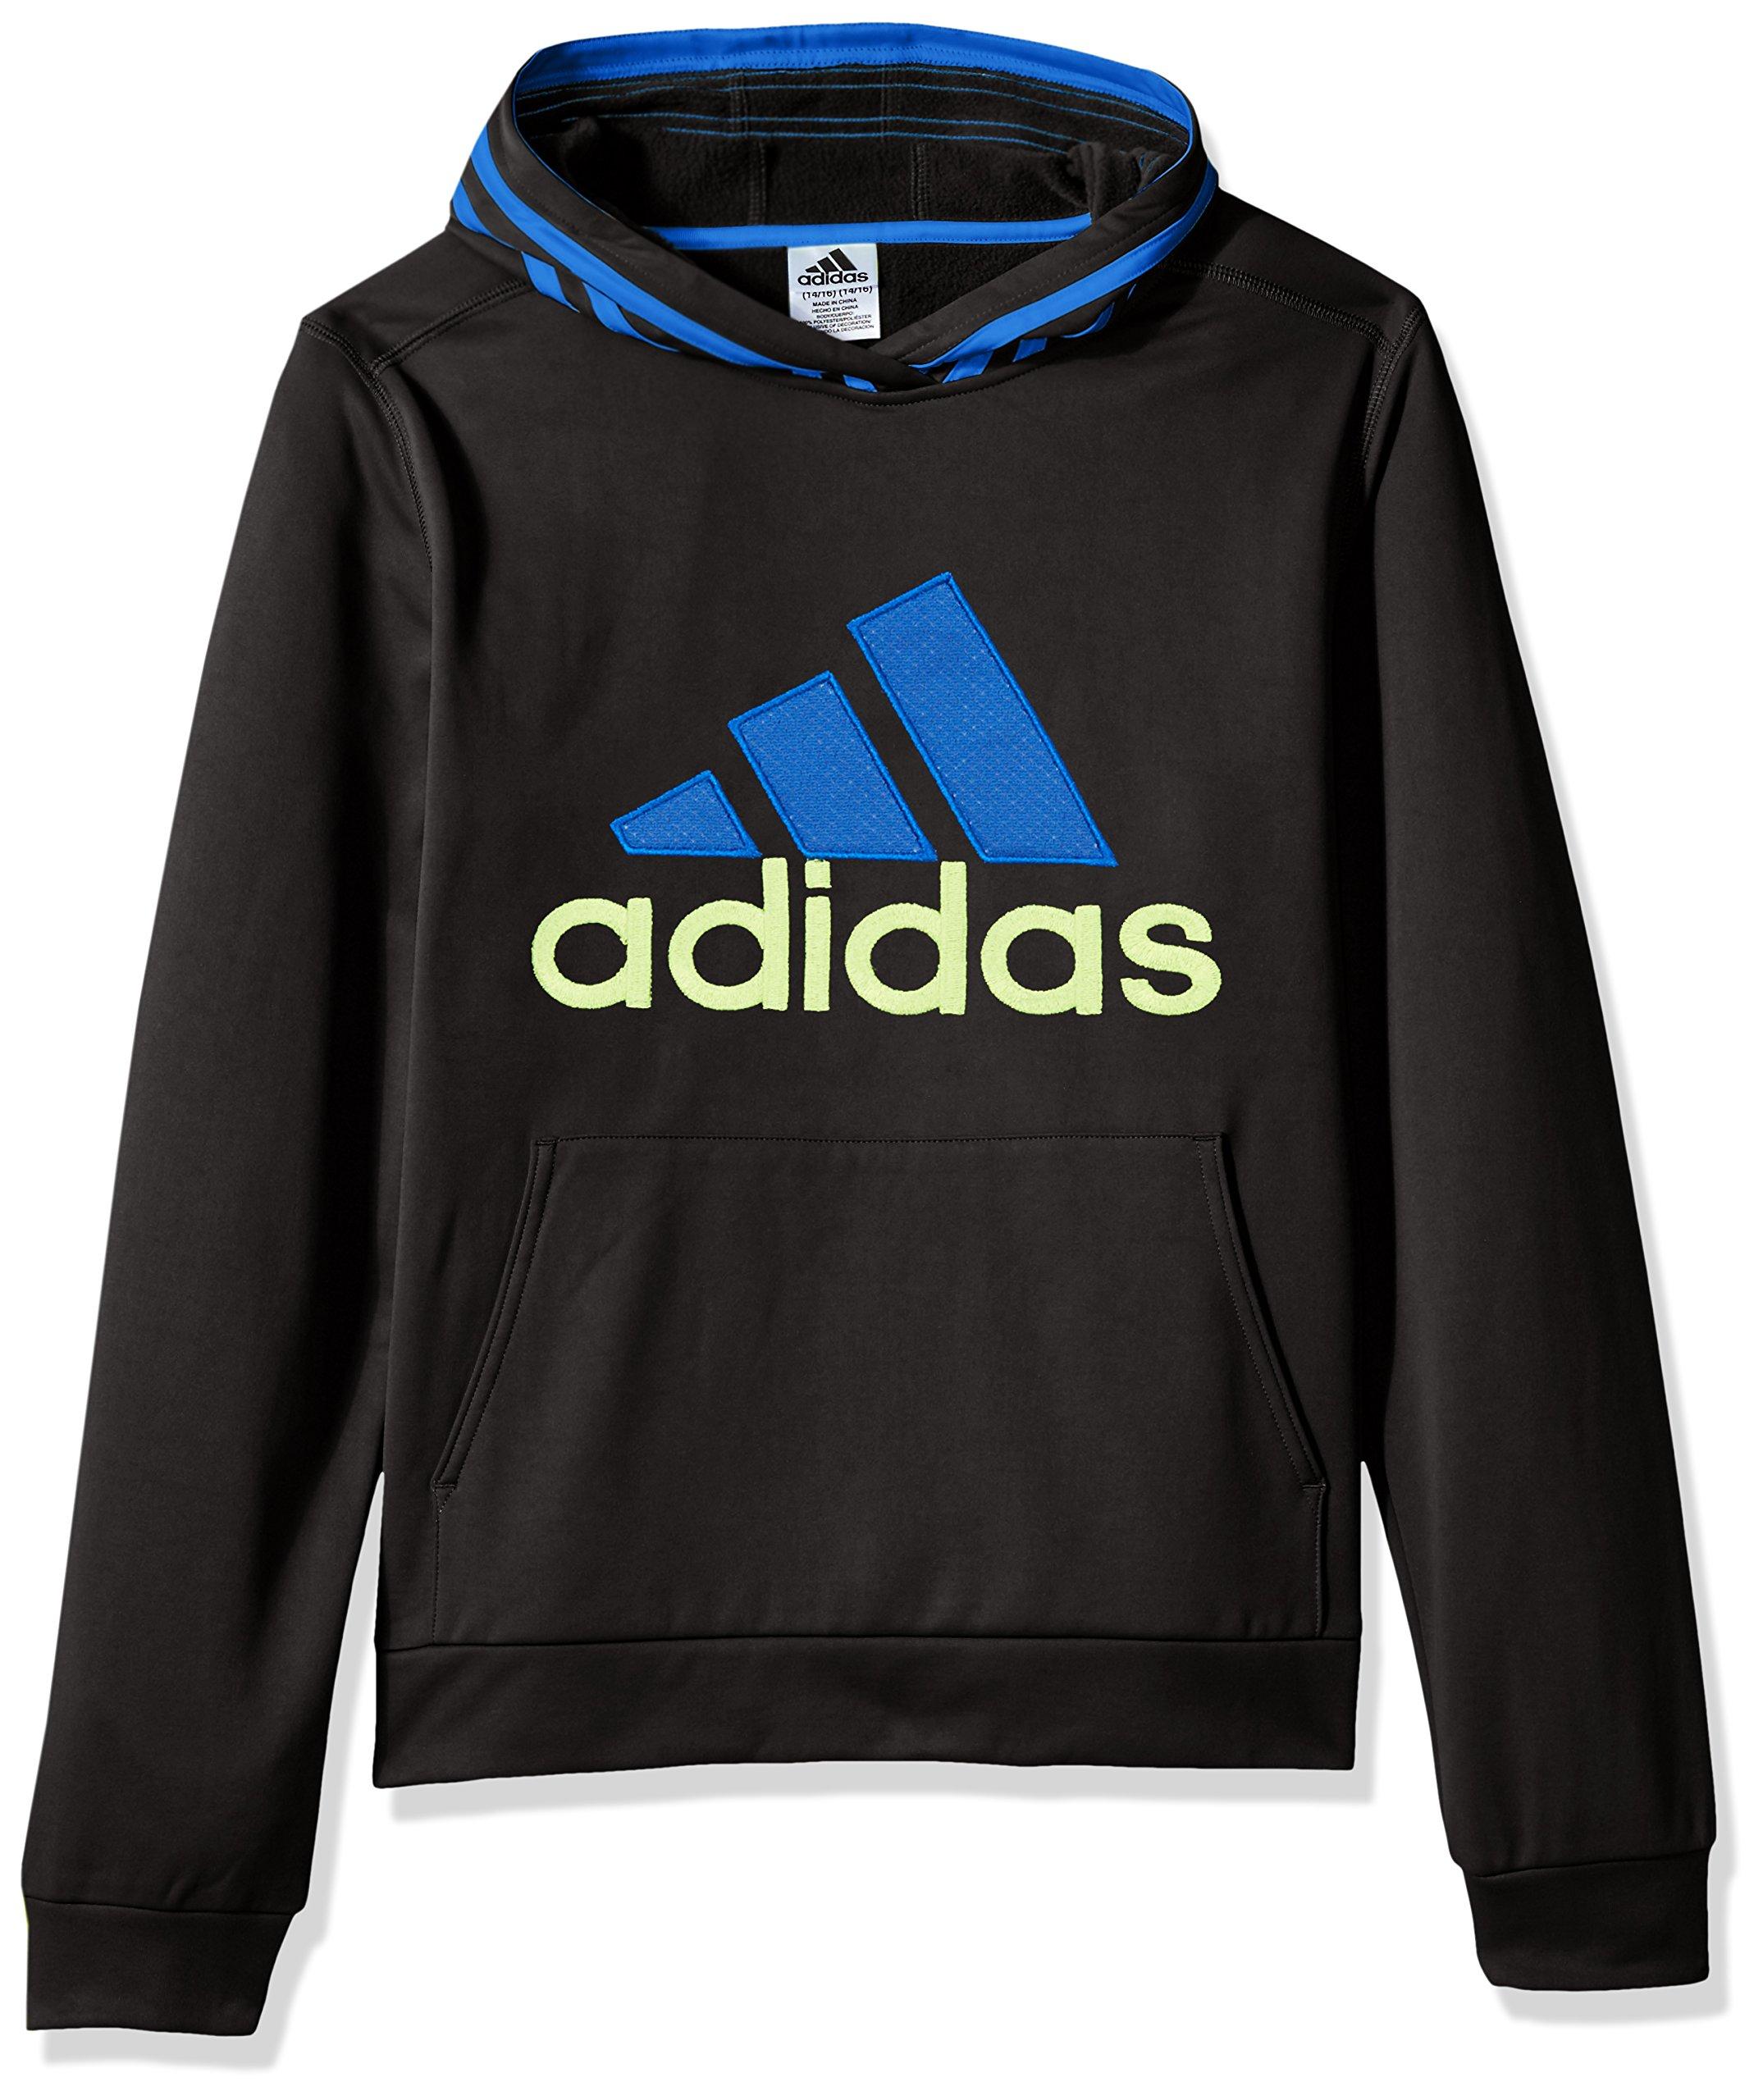 adidas Boys' 6 Athletic Pullover Hoodie, Black/Blue, 6